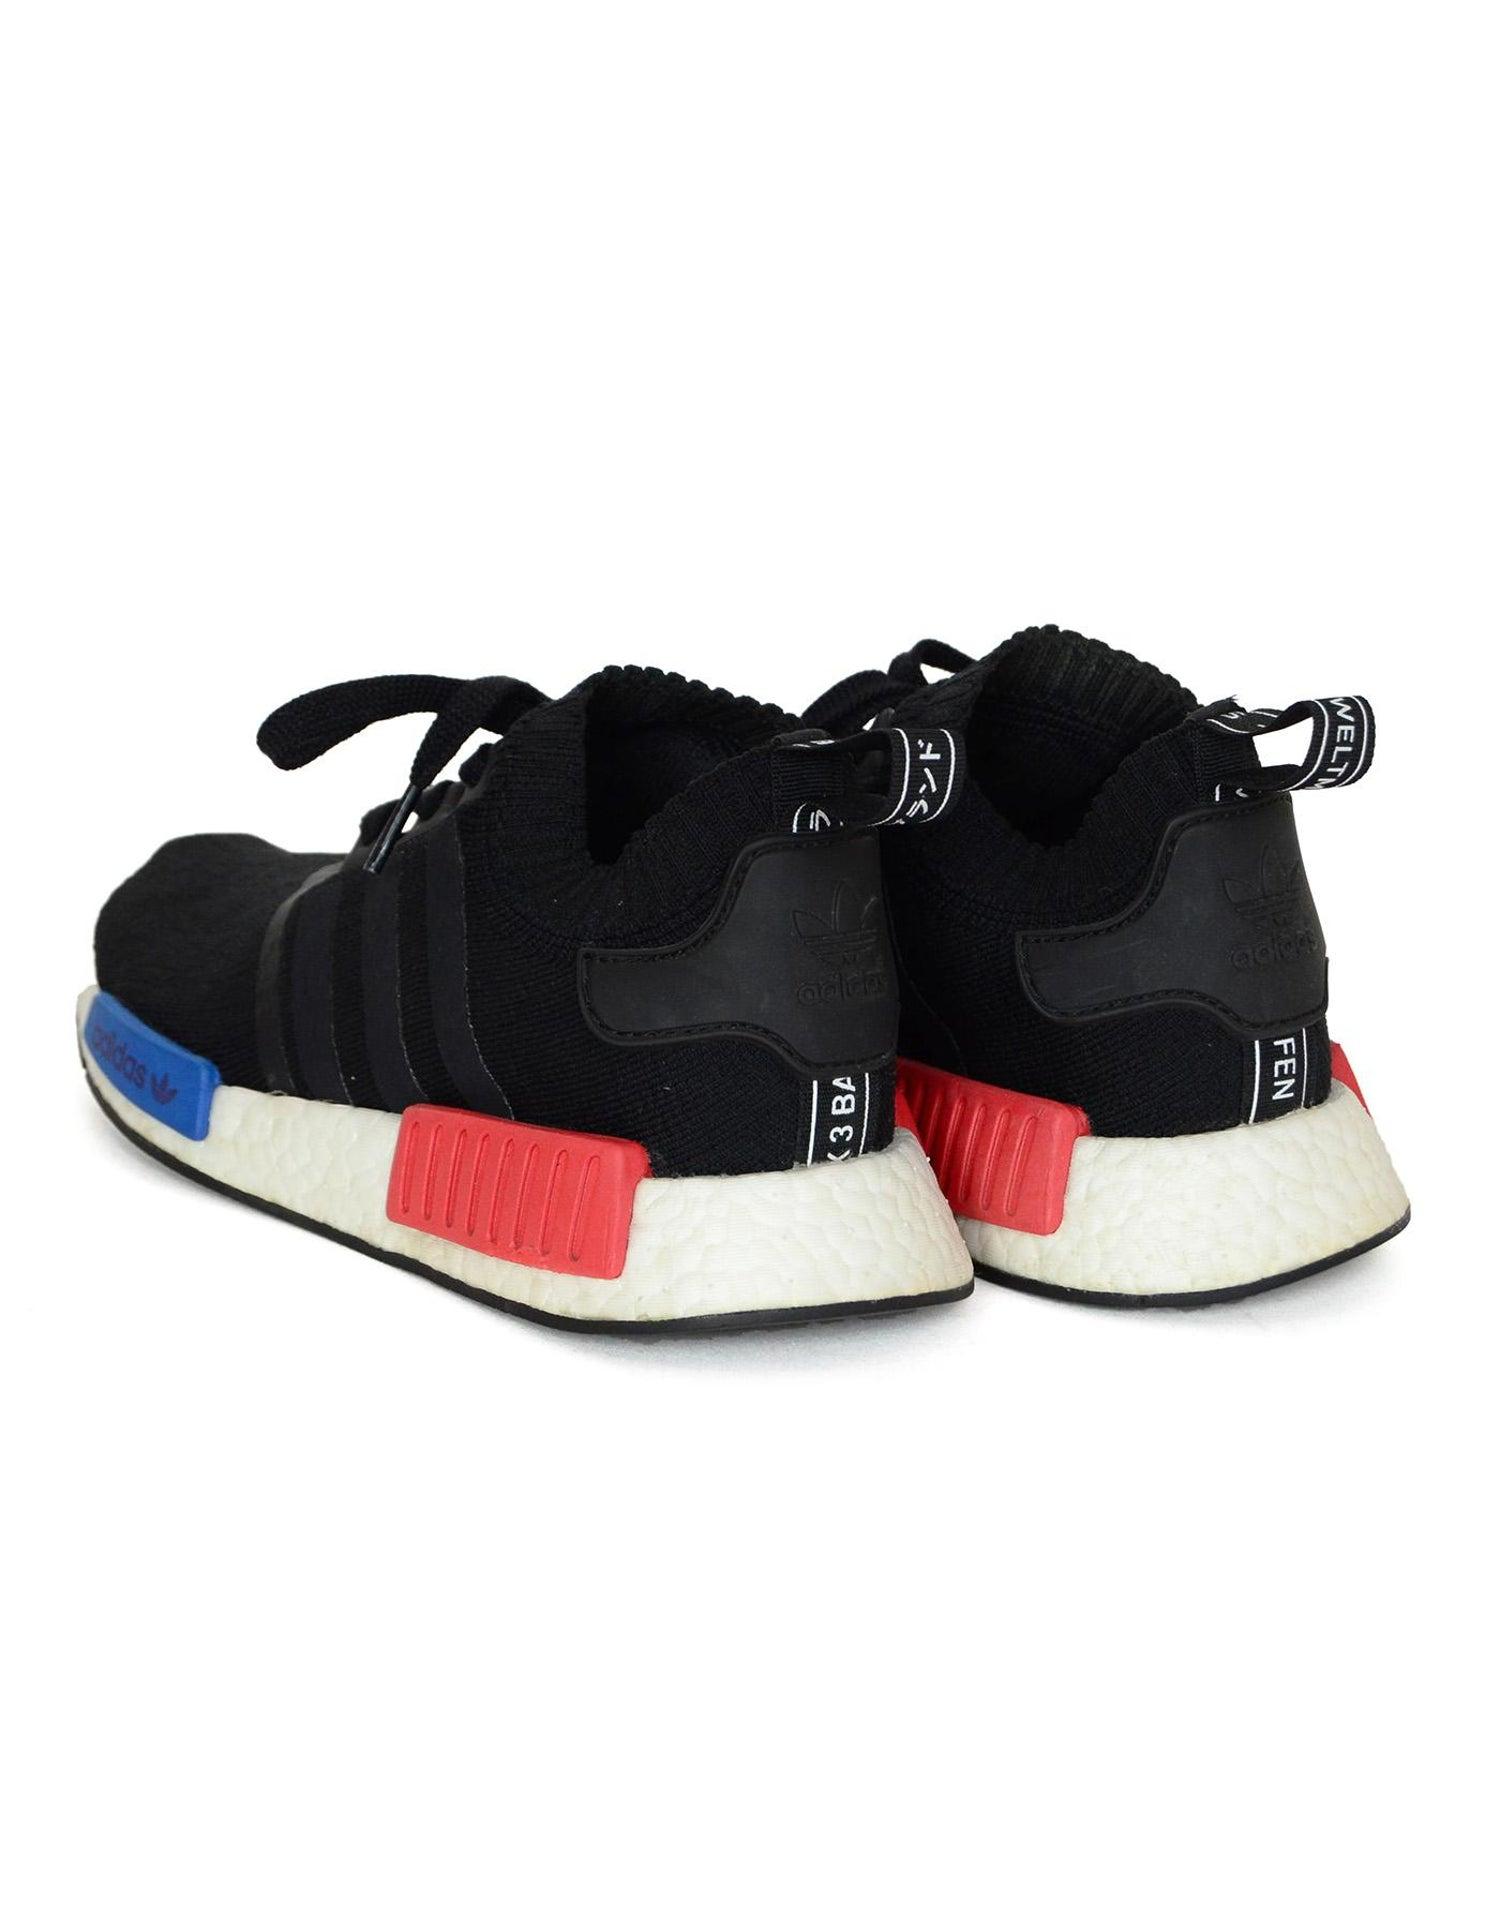 promo code cc22d 4bcc1 Adidas Shoes Adidas Nmd R1 Pk Og 2017 Release Color Black